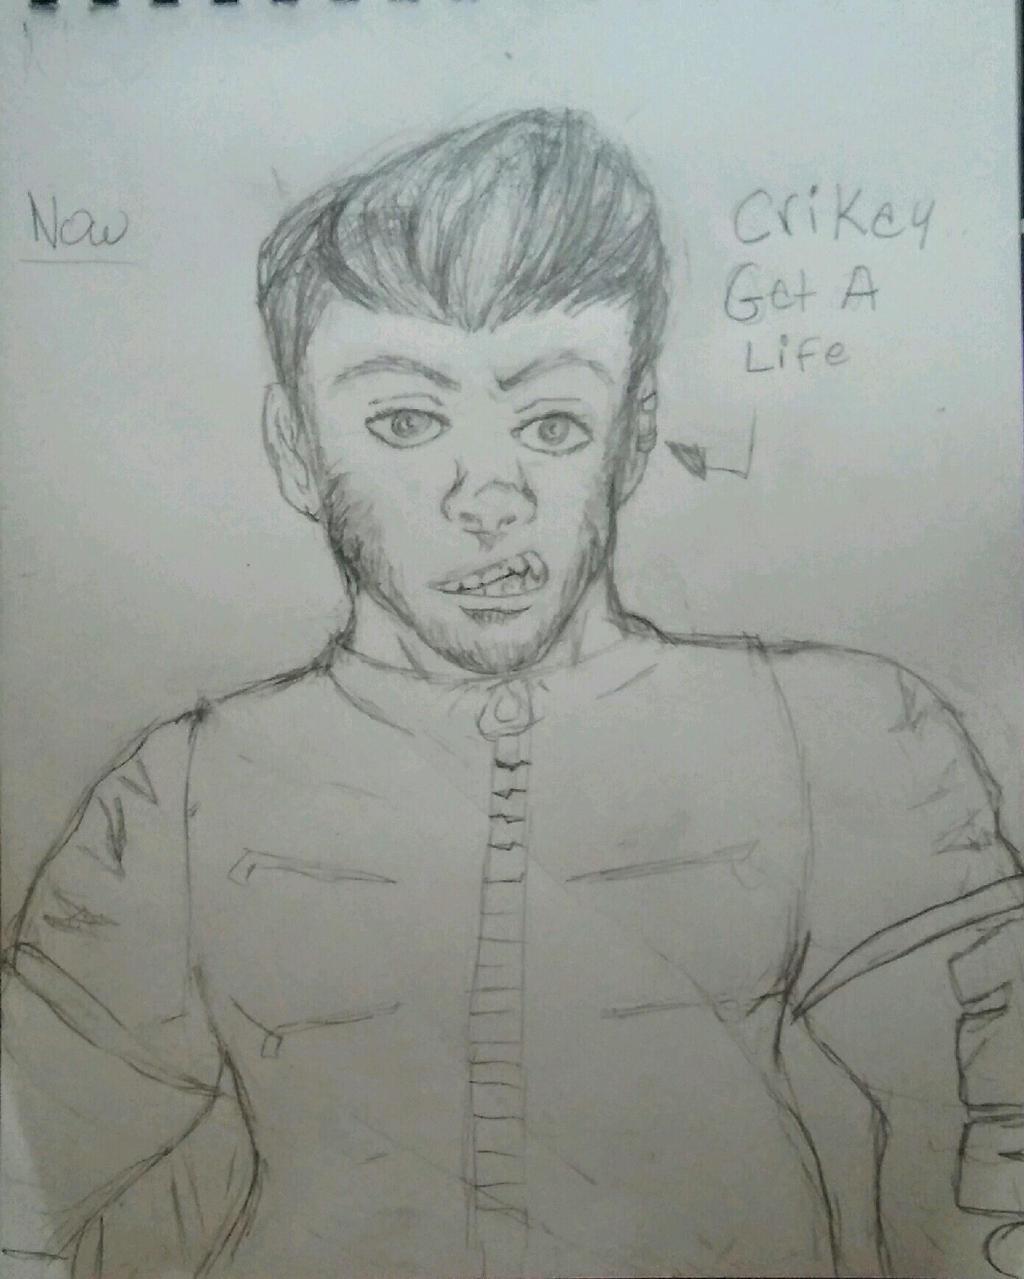 Chuck by HecsabaTH